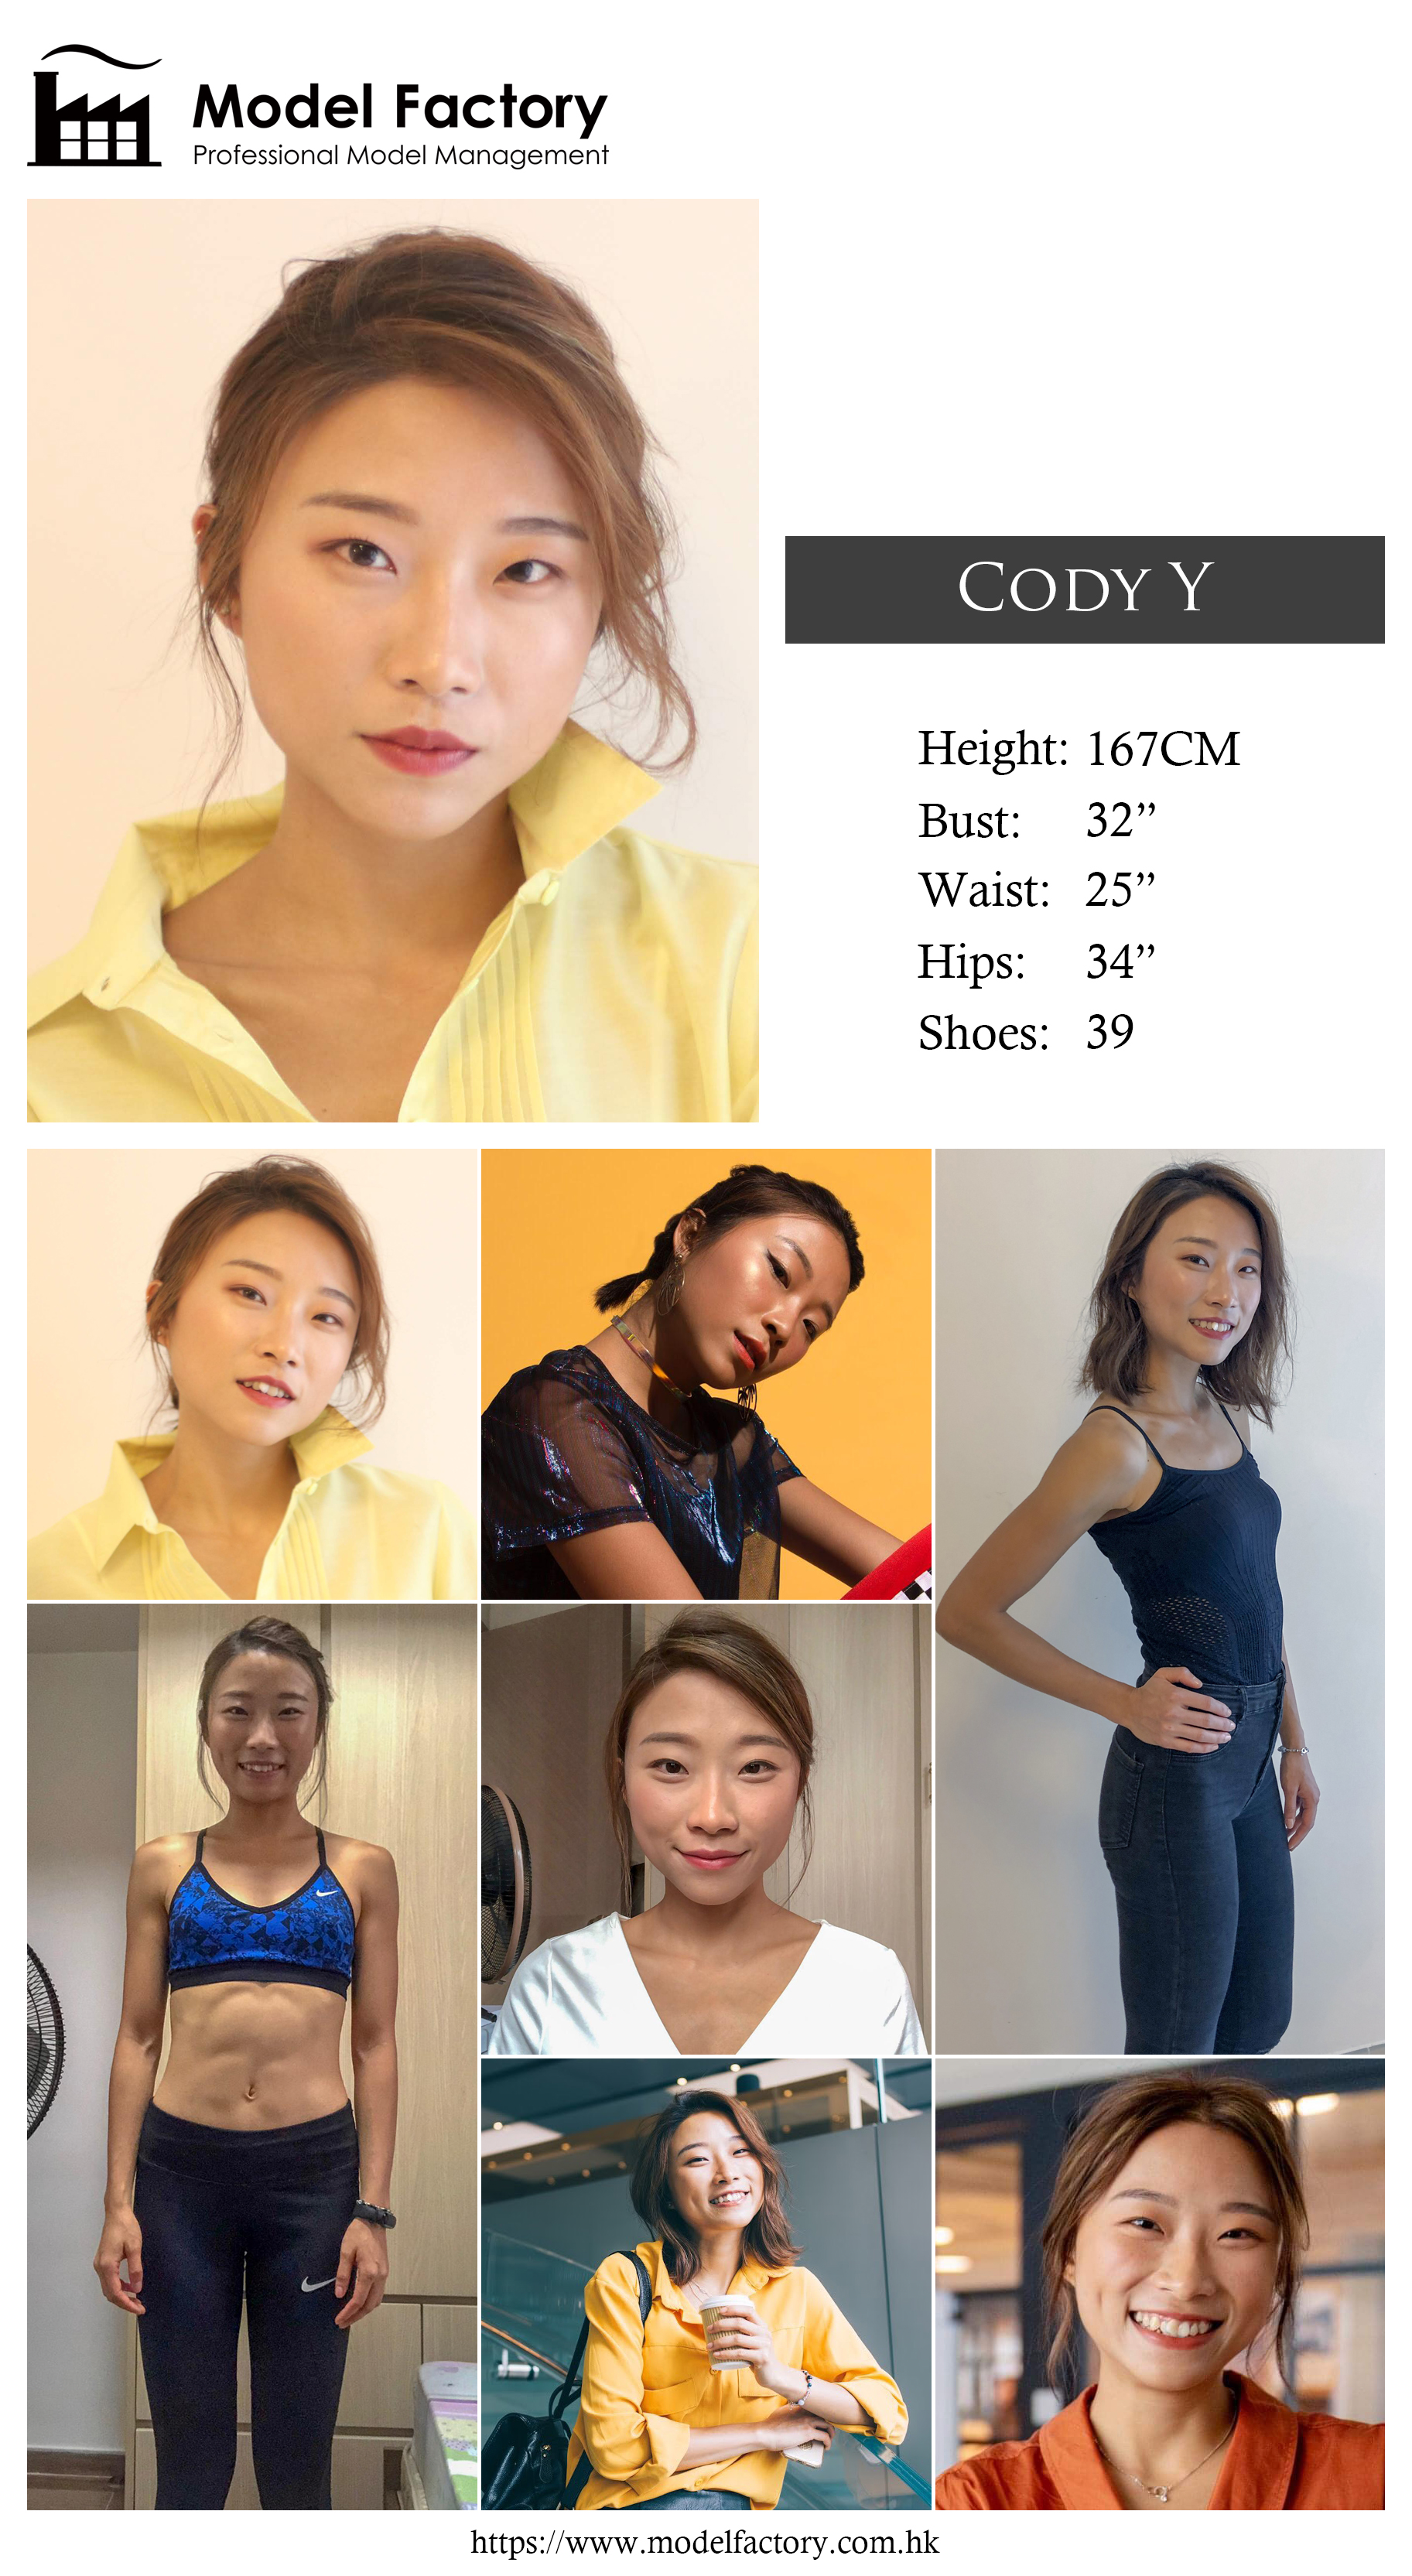 Model Factory Hong Kong Female Model CodyY